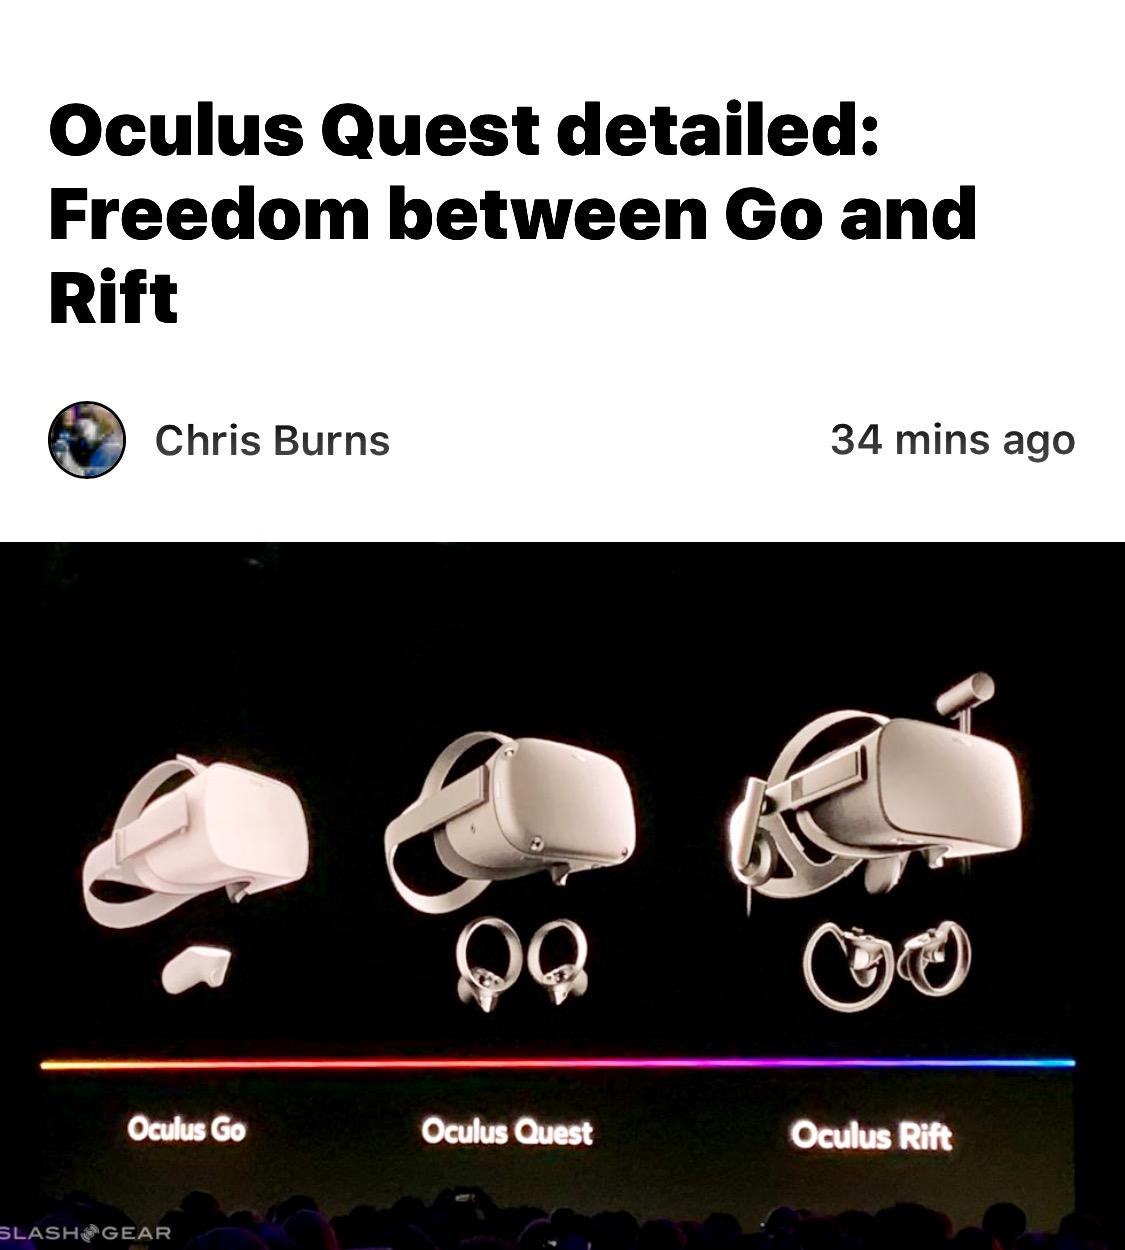 Facebook Announces Oculus Quest VR Headset